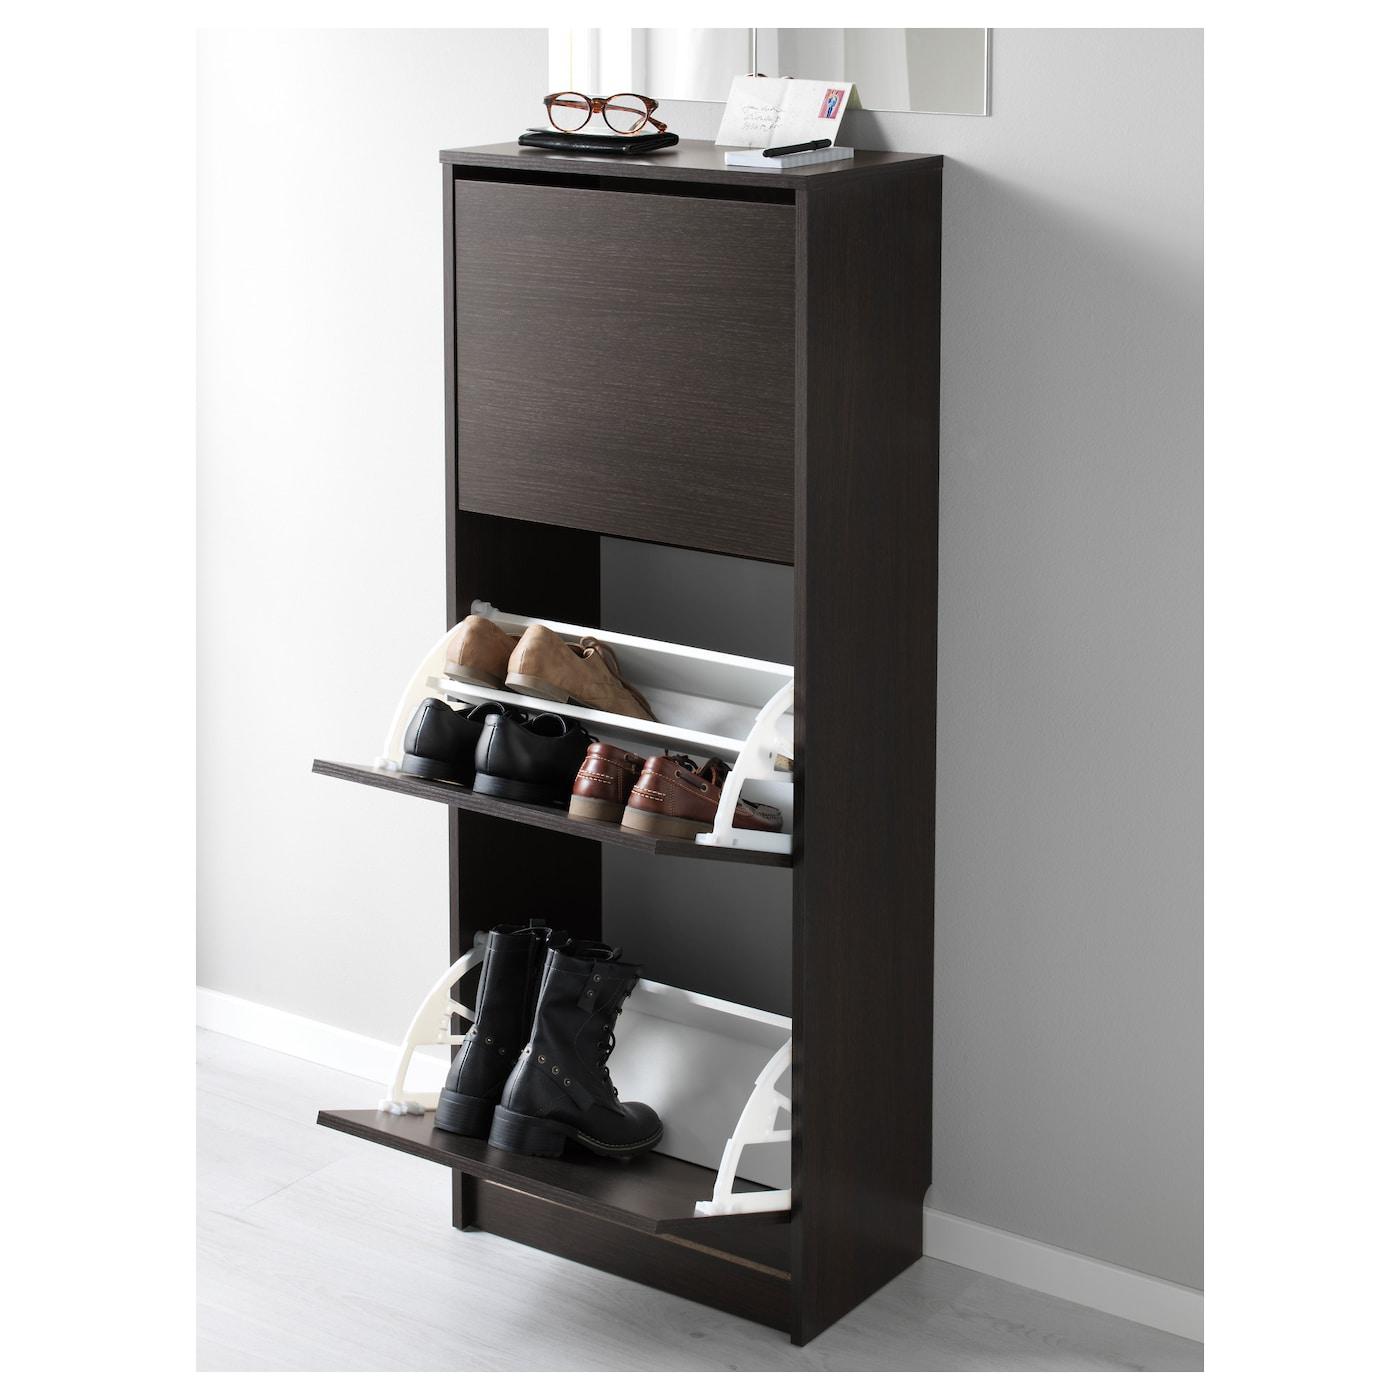 bissa shoe cabinet with 3 compartments black brown 49 x. Black Bedroom Furniture Sets. Home Design Ideas